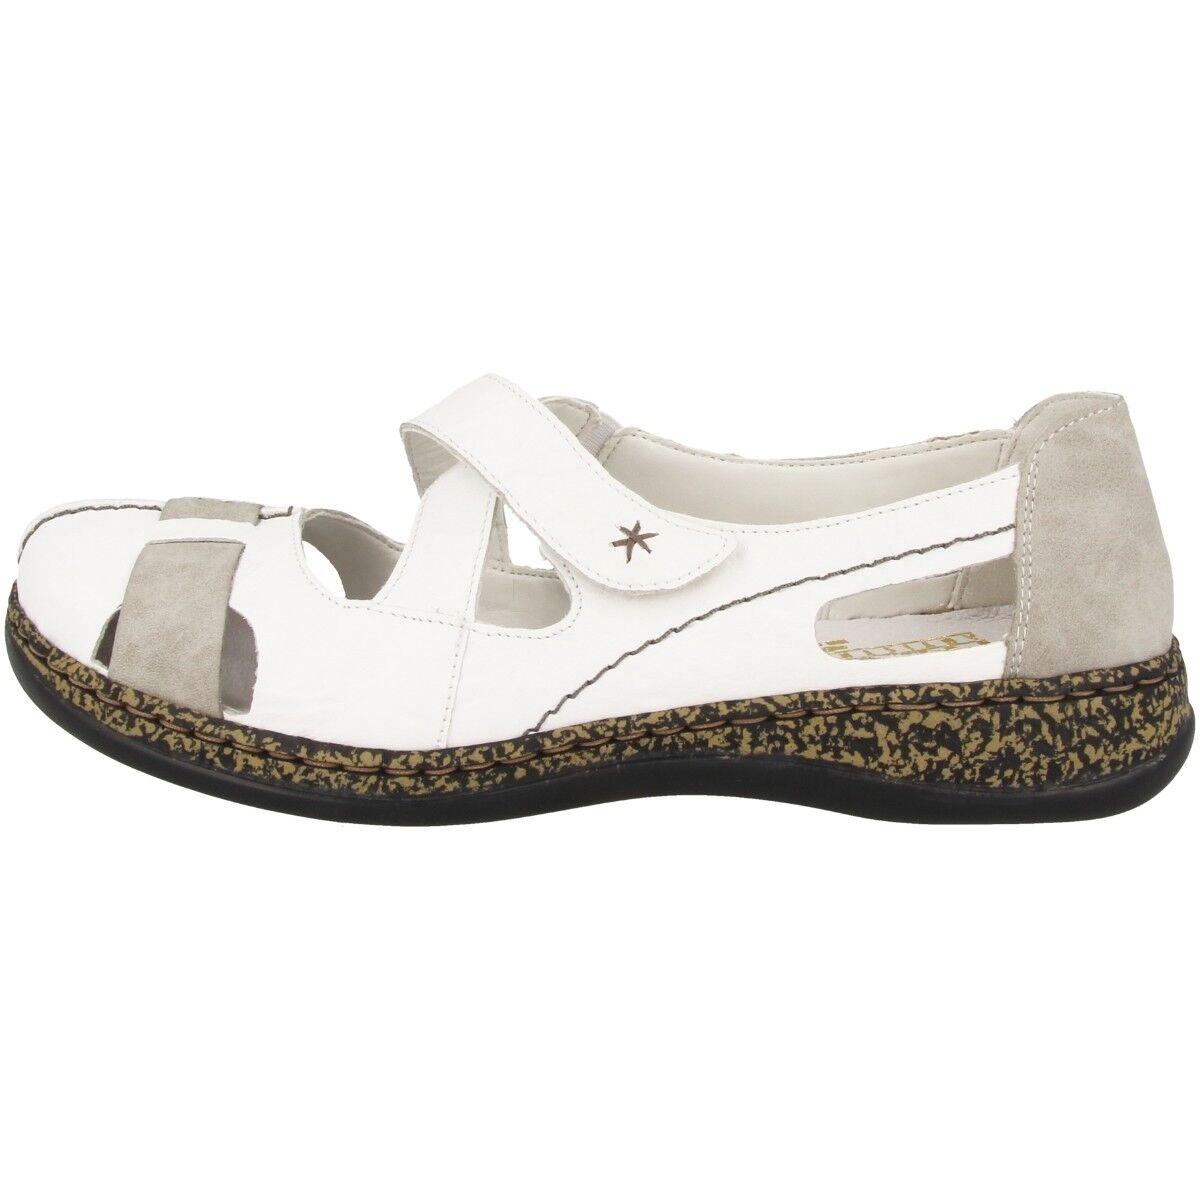 Rieker sandali MASSA scarpe donna ballerina sandali Rieker pantofola BIANCO Combination 178d6f